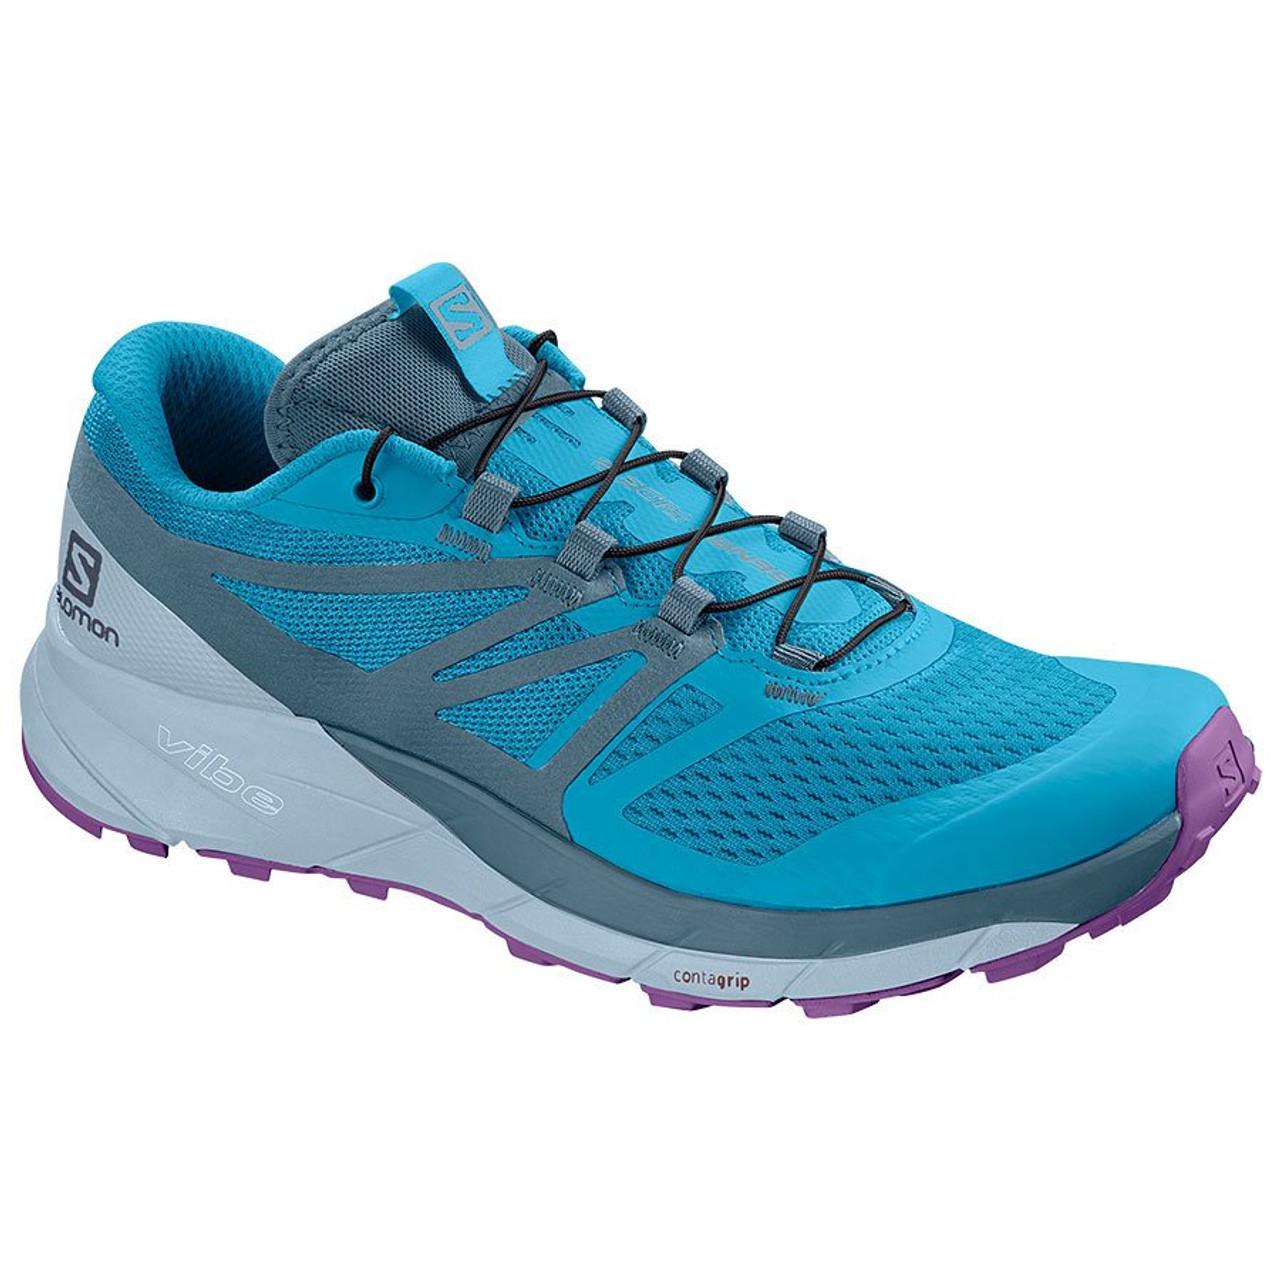 Salomon Sense Ride 2 Women's Shoe